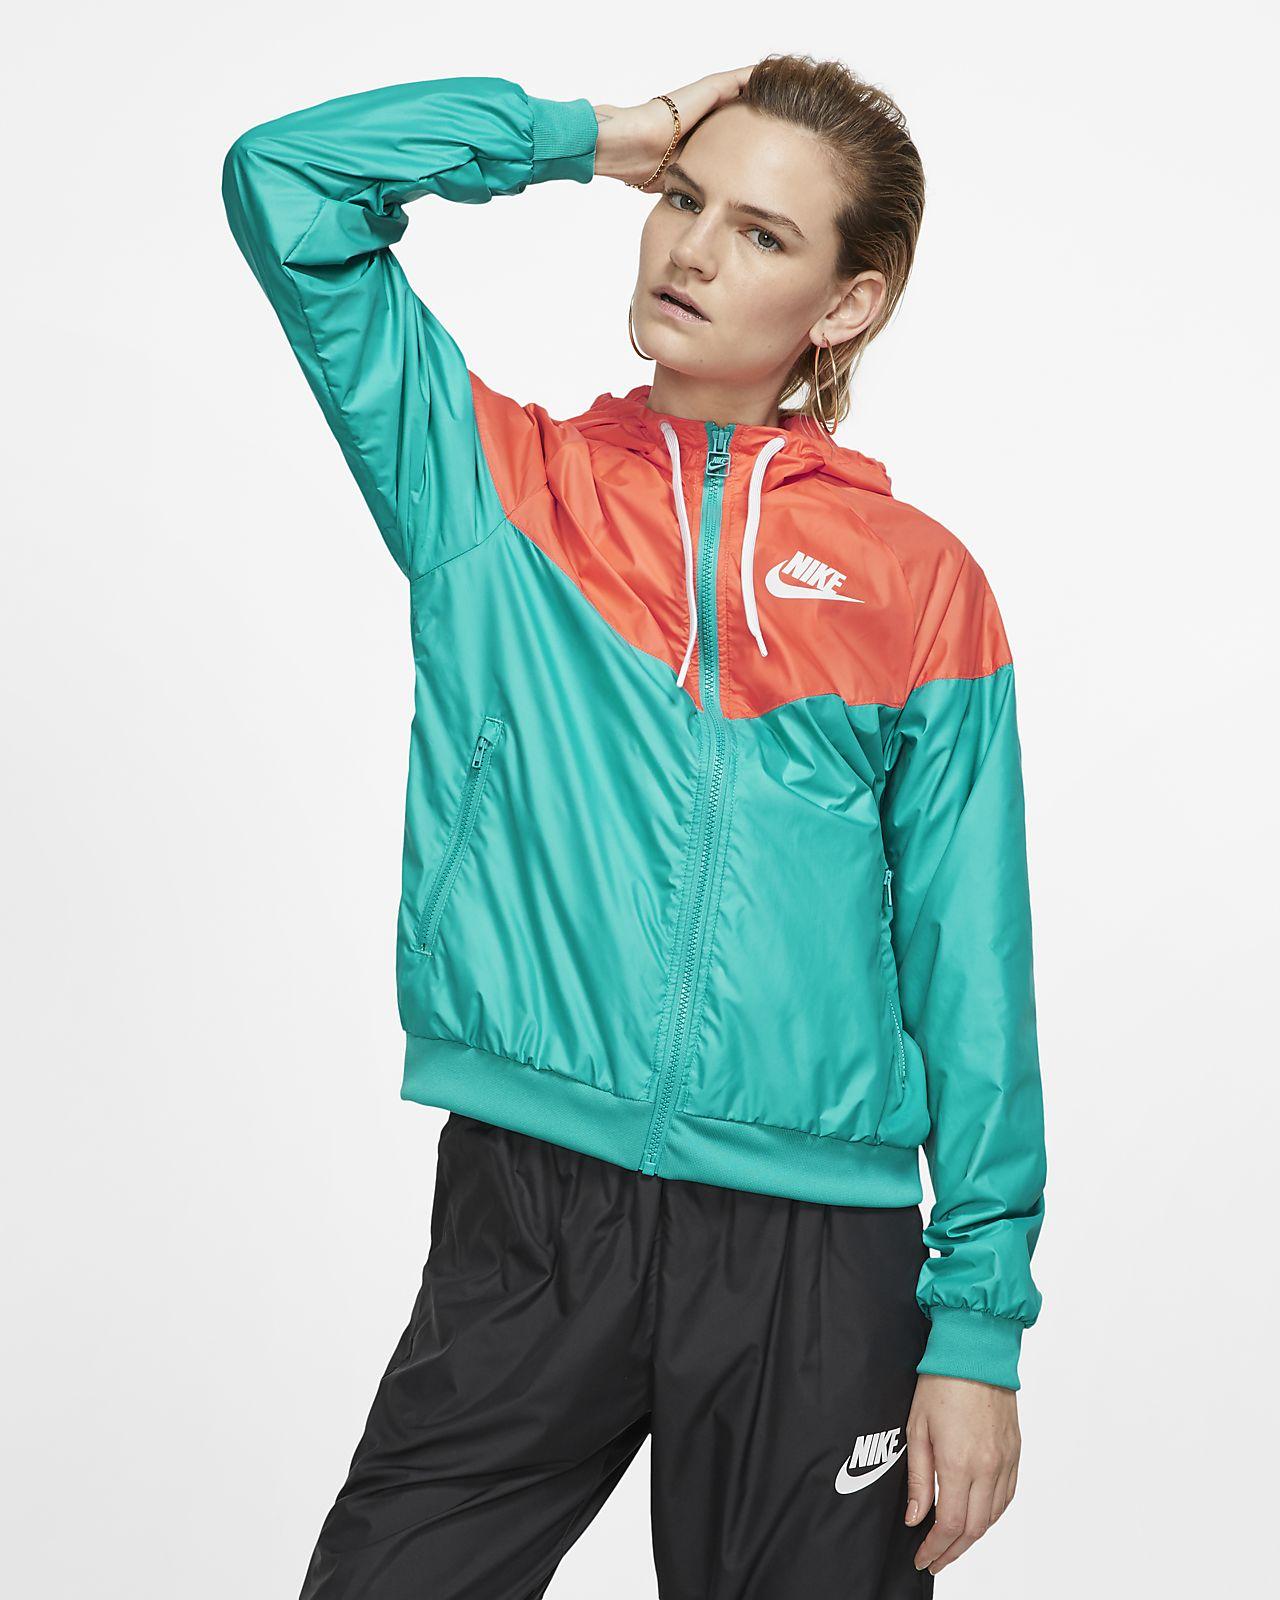 0f0bbaae4 Nike Sportswear Windrunner Women's Jacket. Nike.com SG